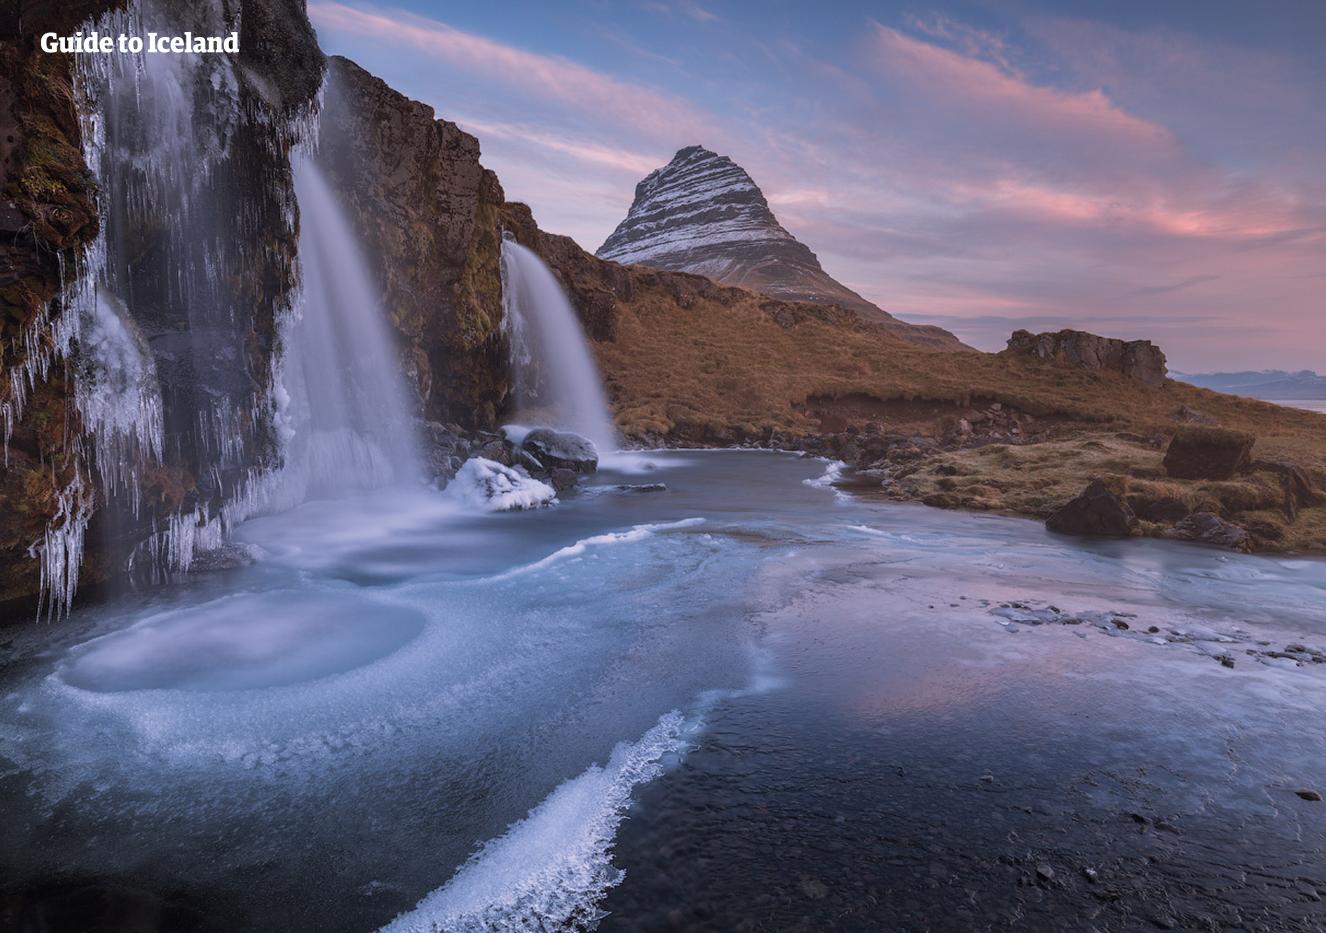 Автотур «Игра престолов» | Исландия за 10 дней - day 7